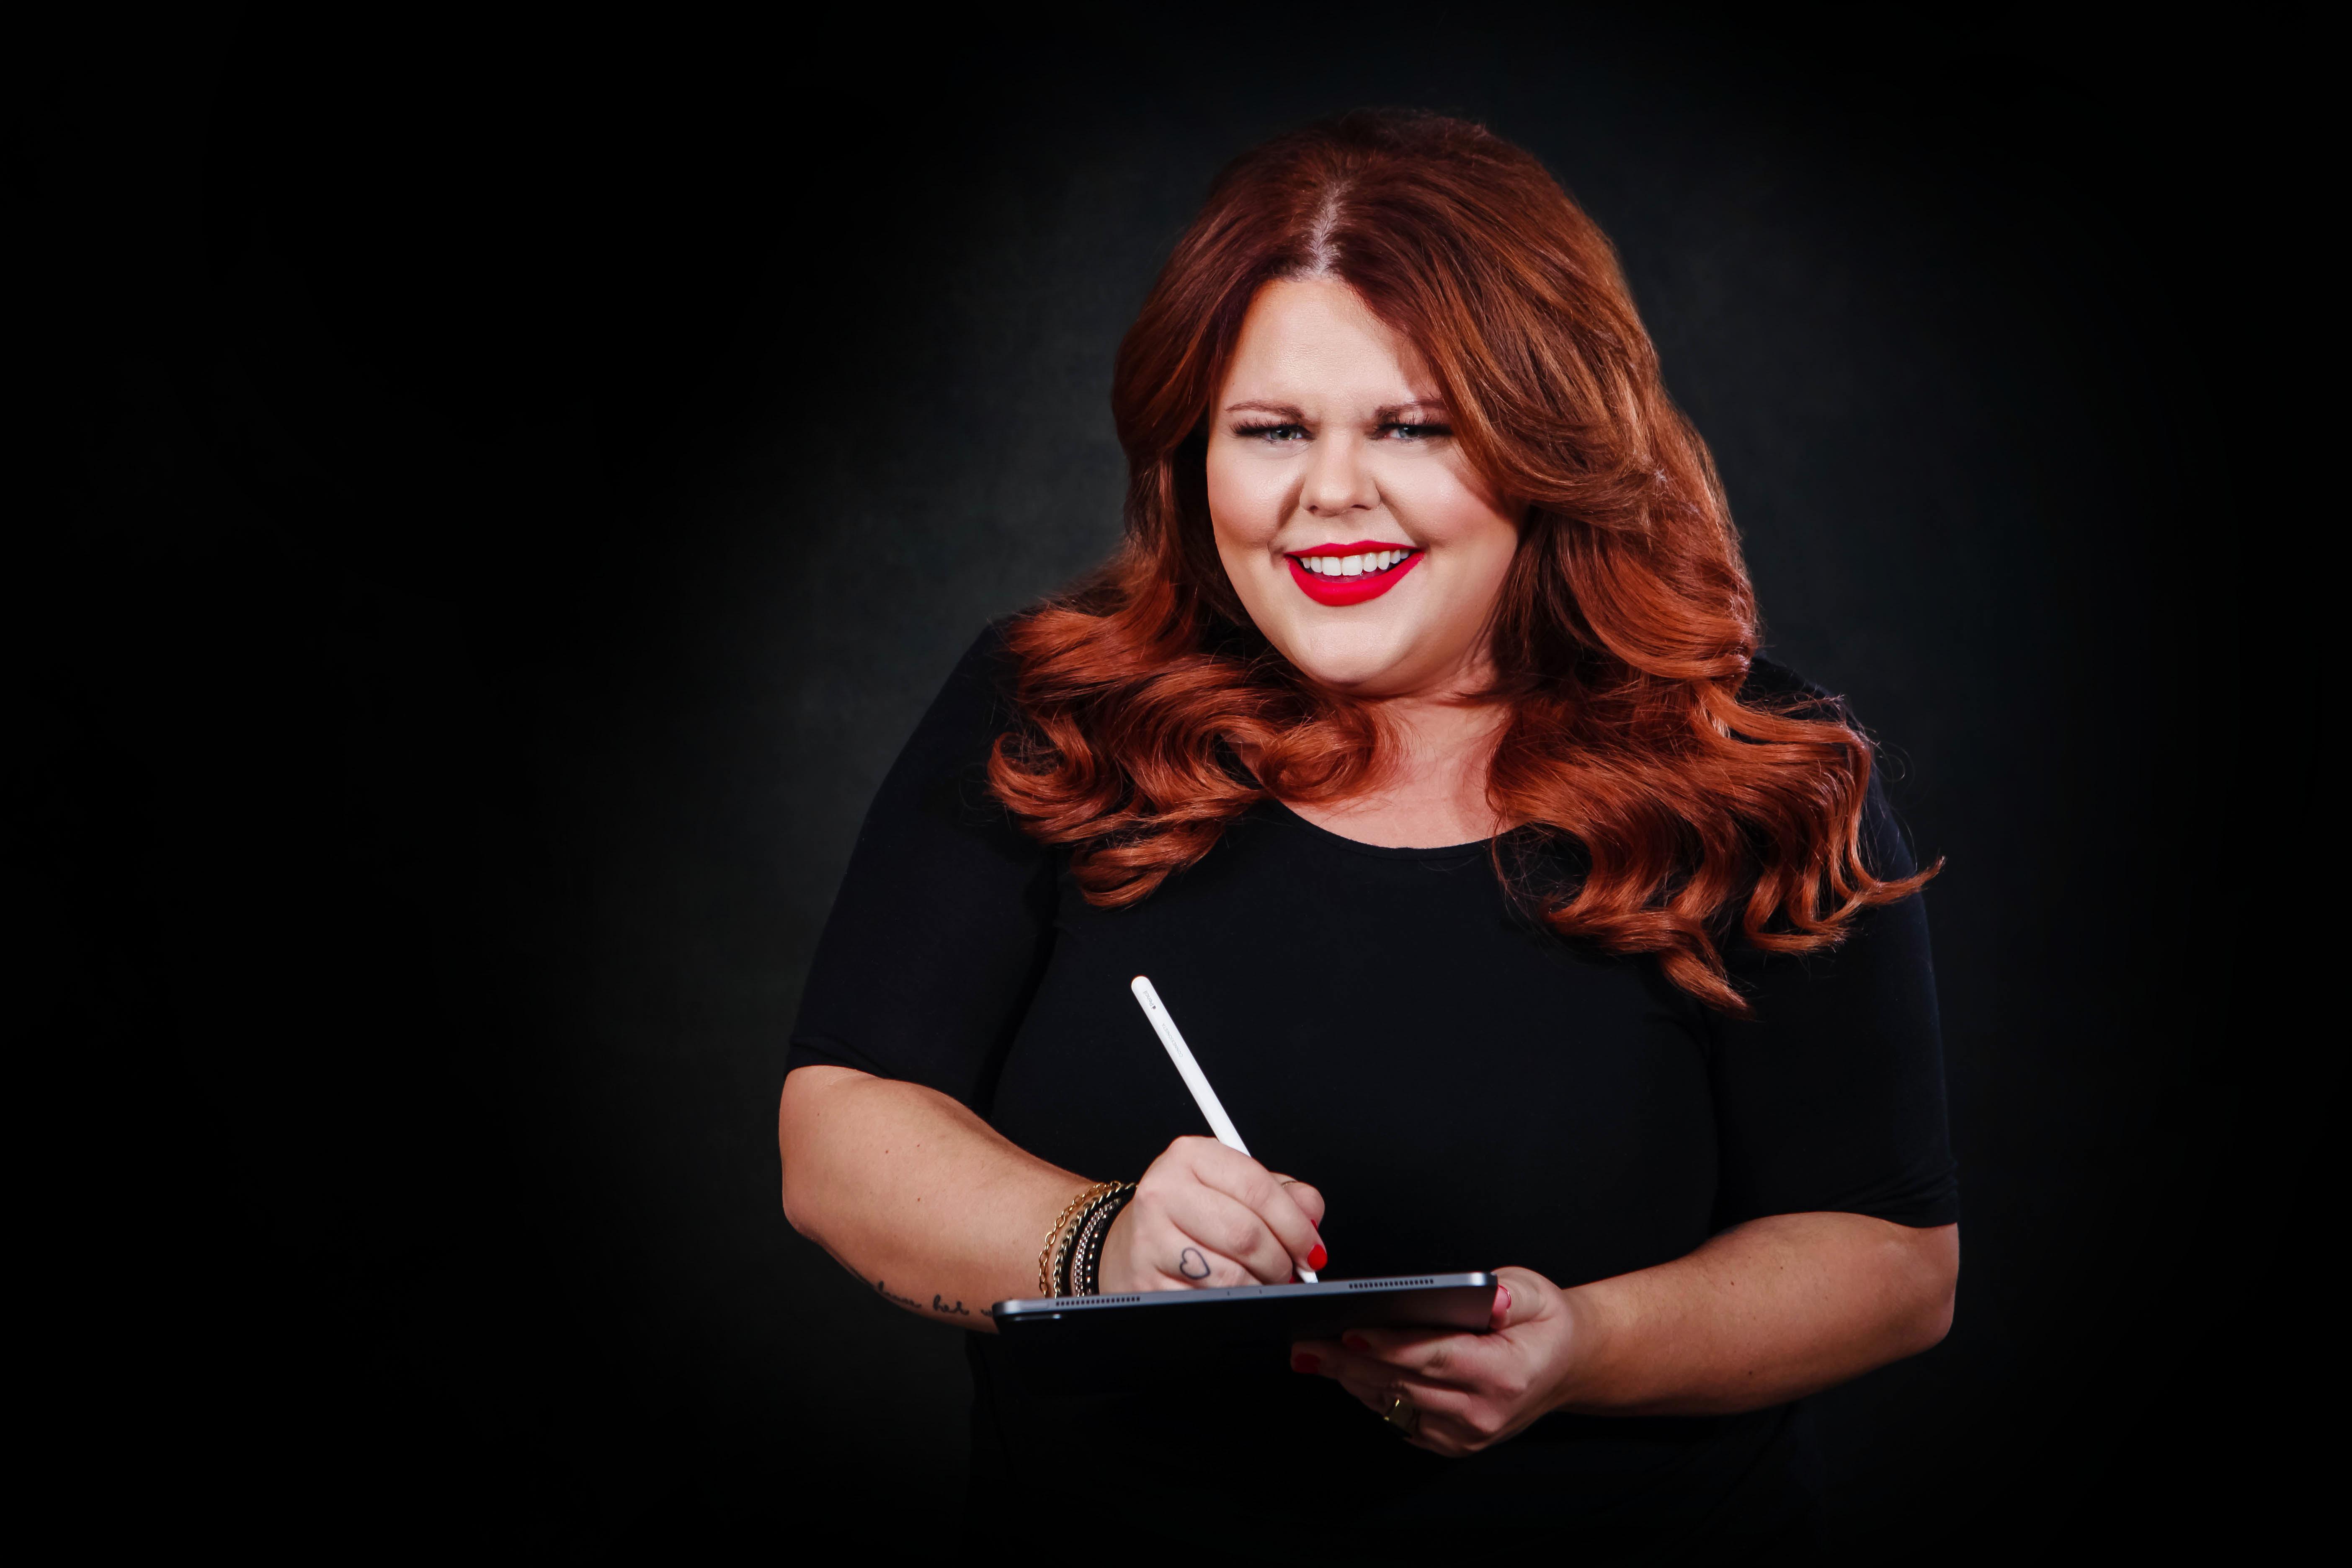 Karine Parthenais writing on IPad with stylus